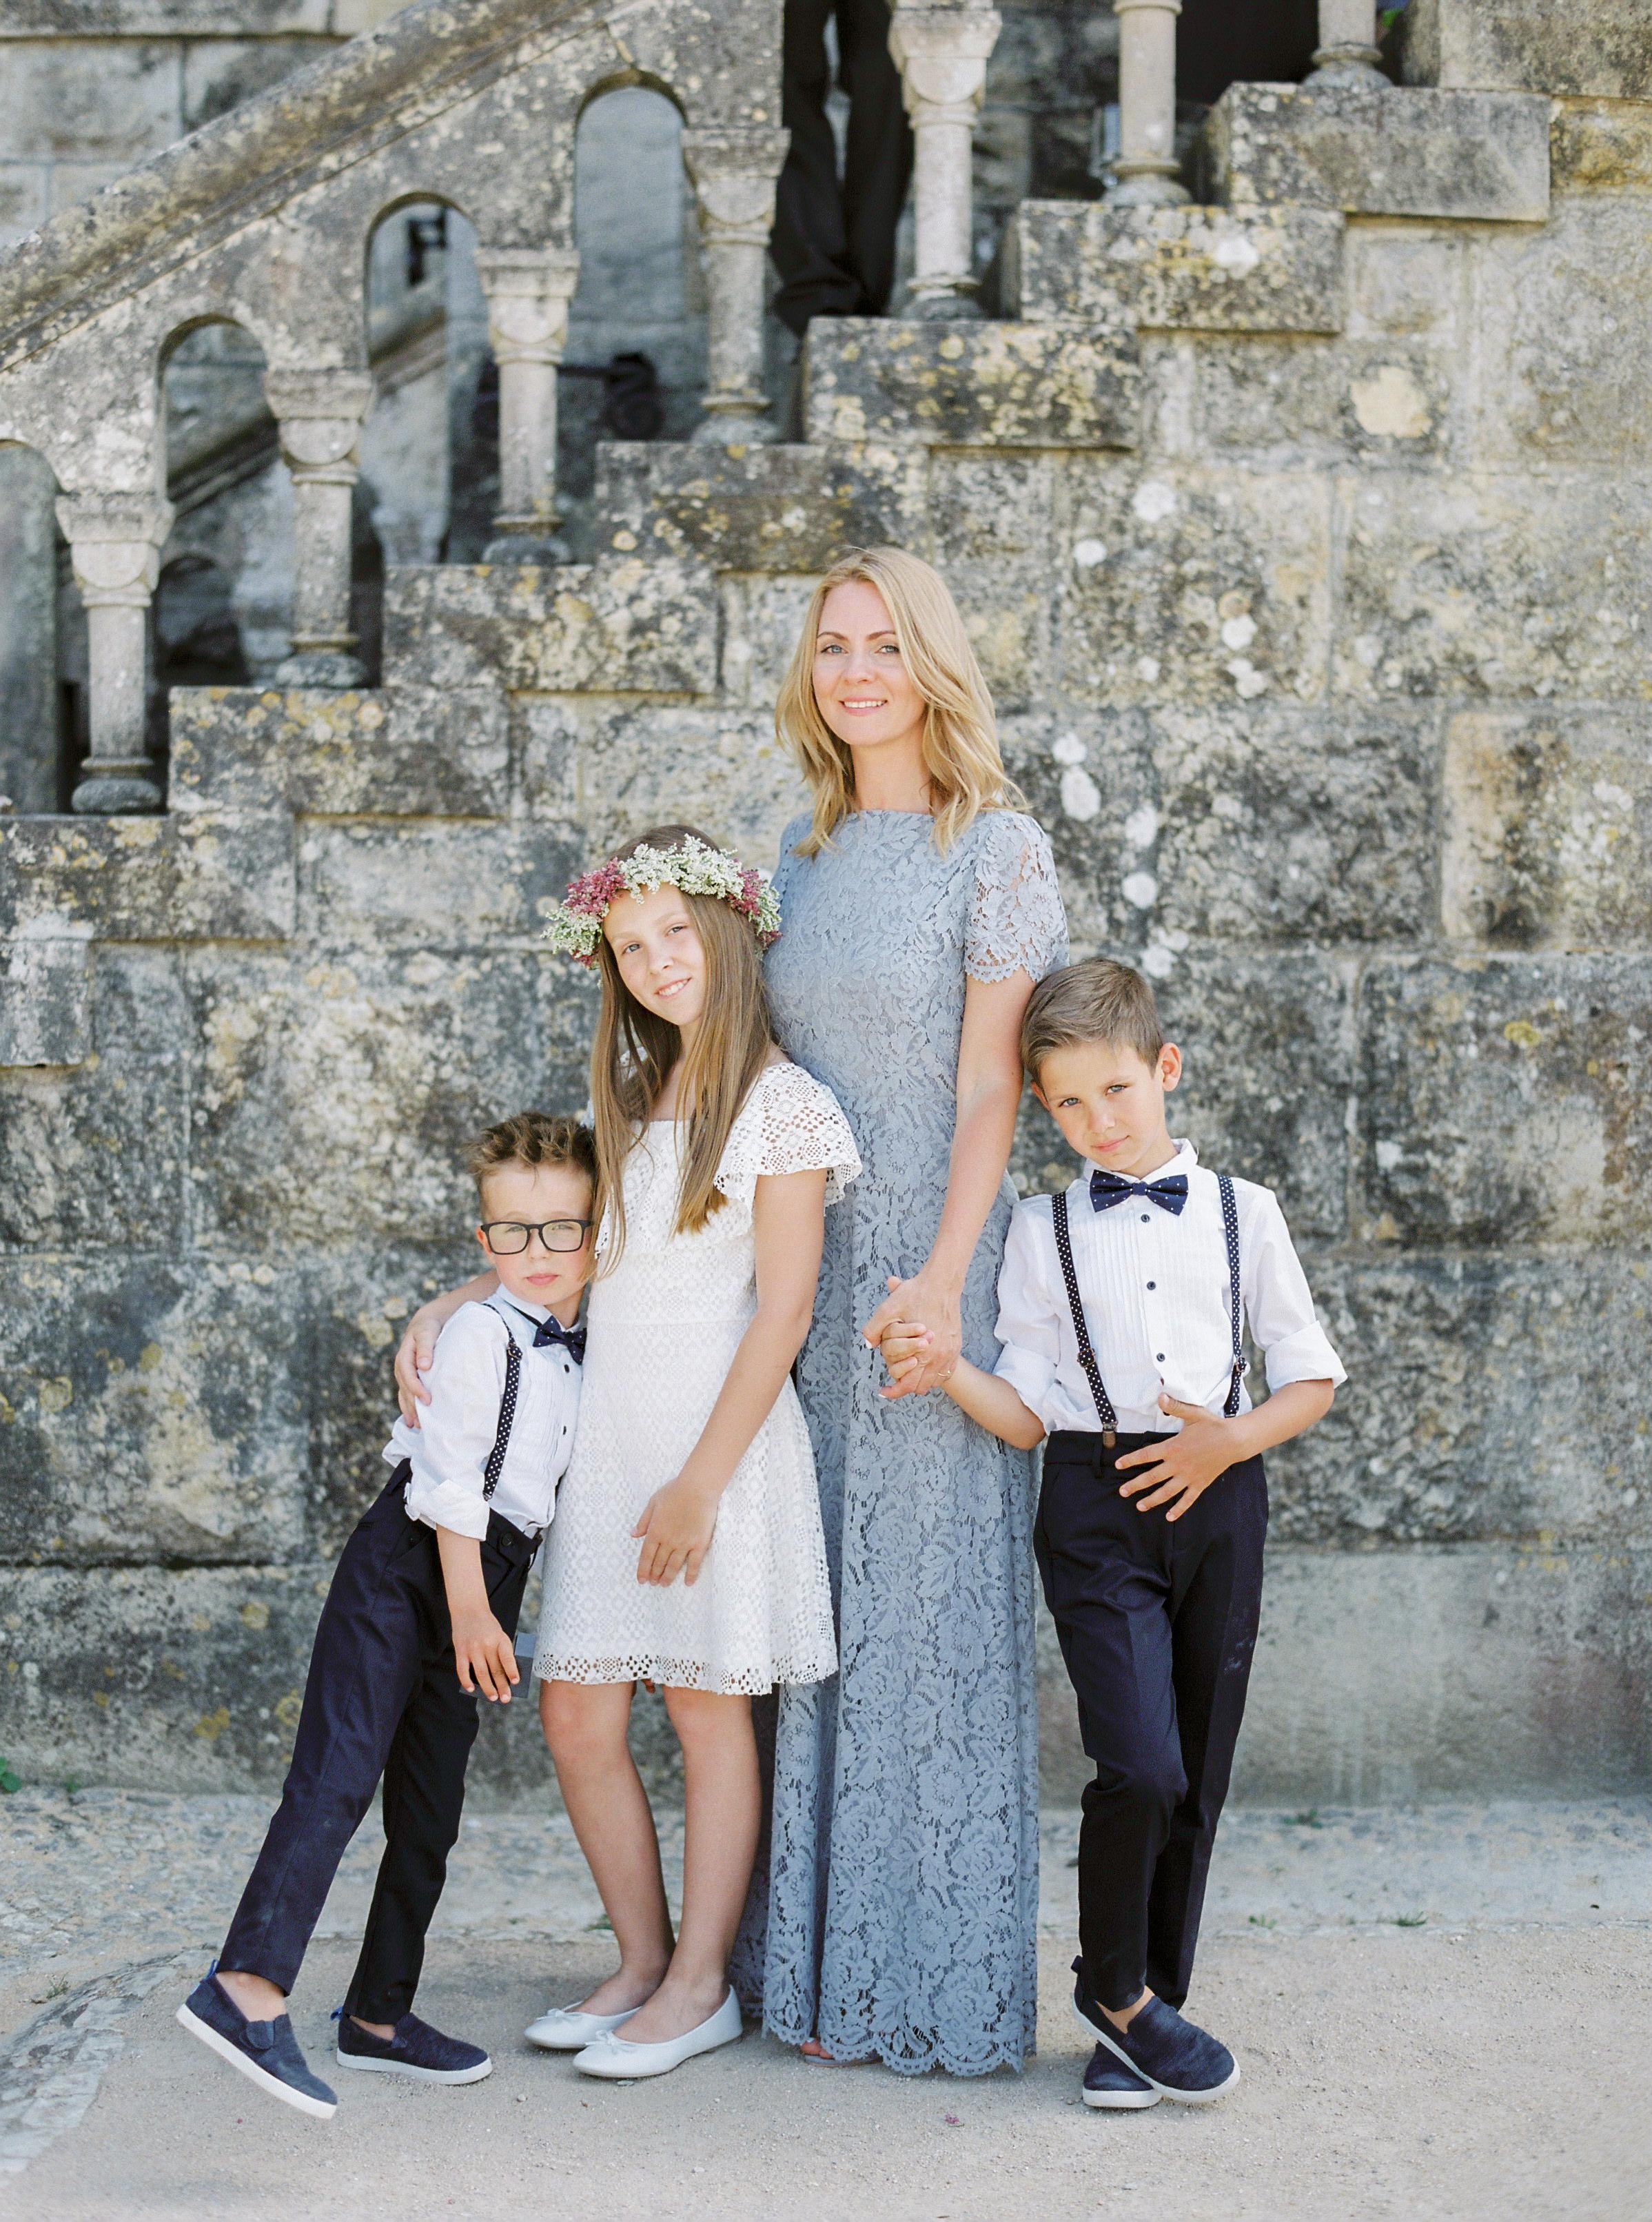 Nastia_Vesna_Photography_Wedding_Portugal_41.jpg